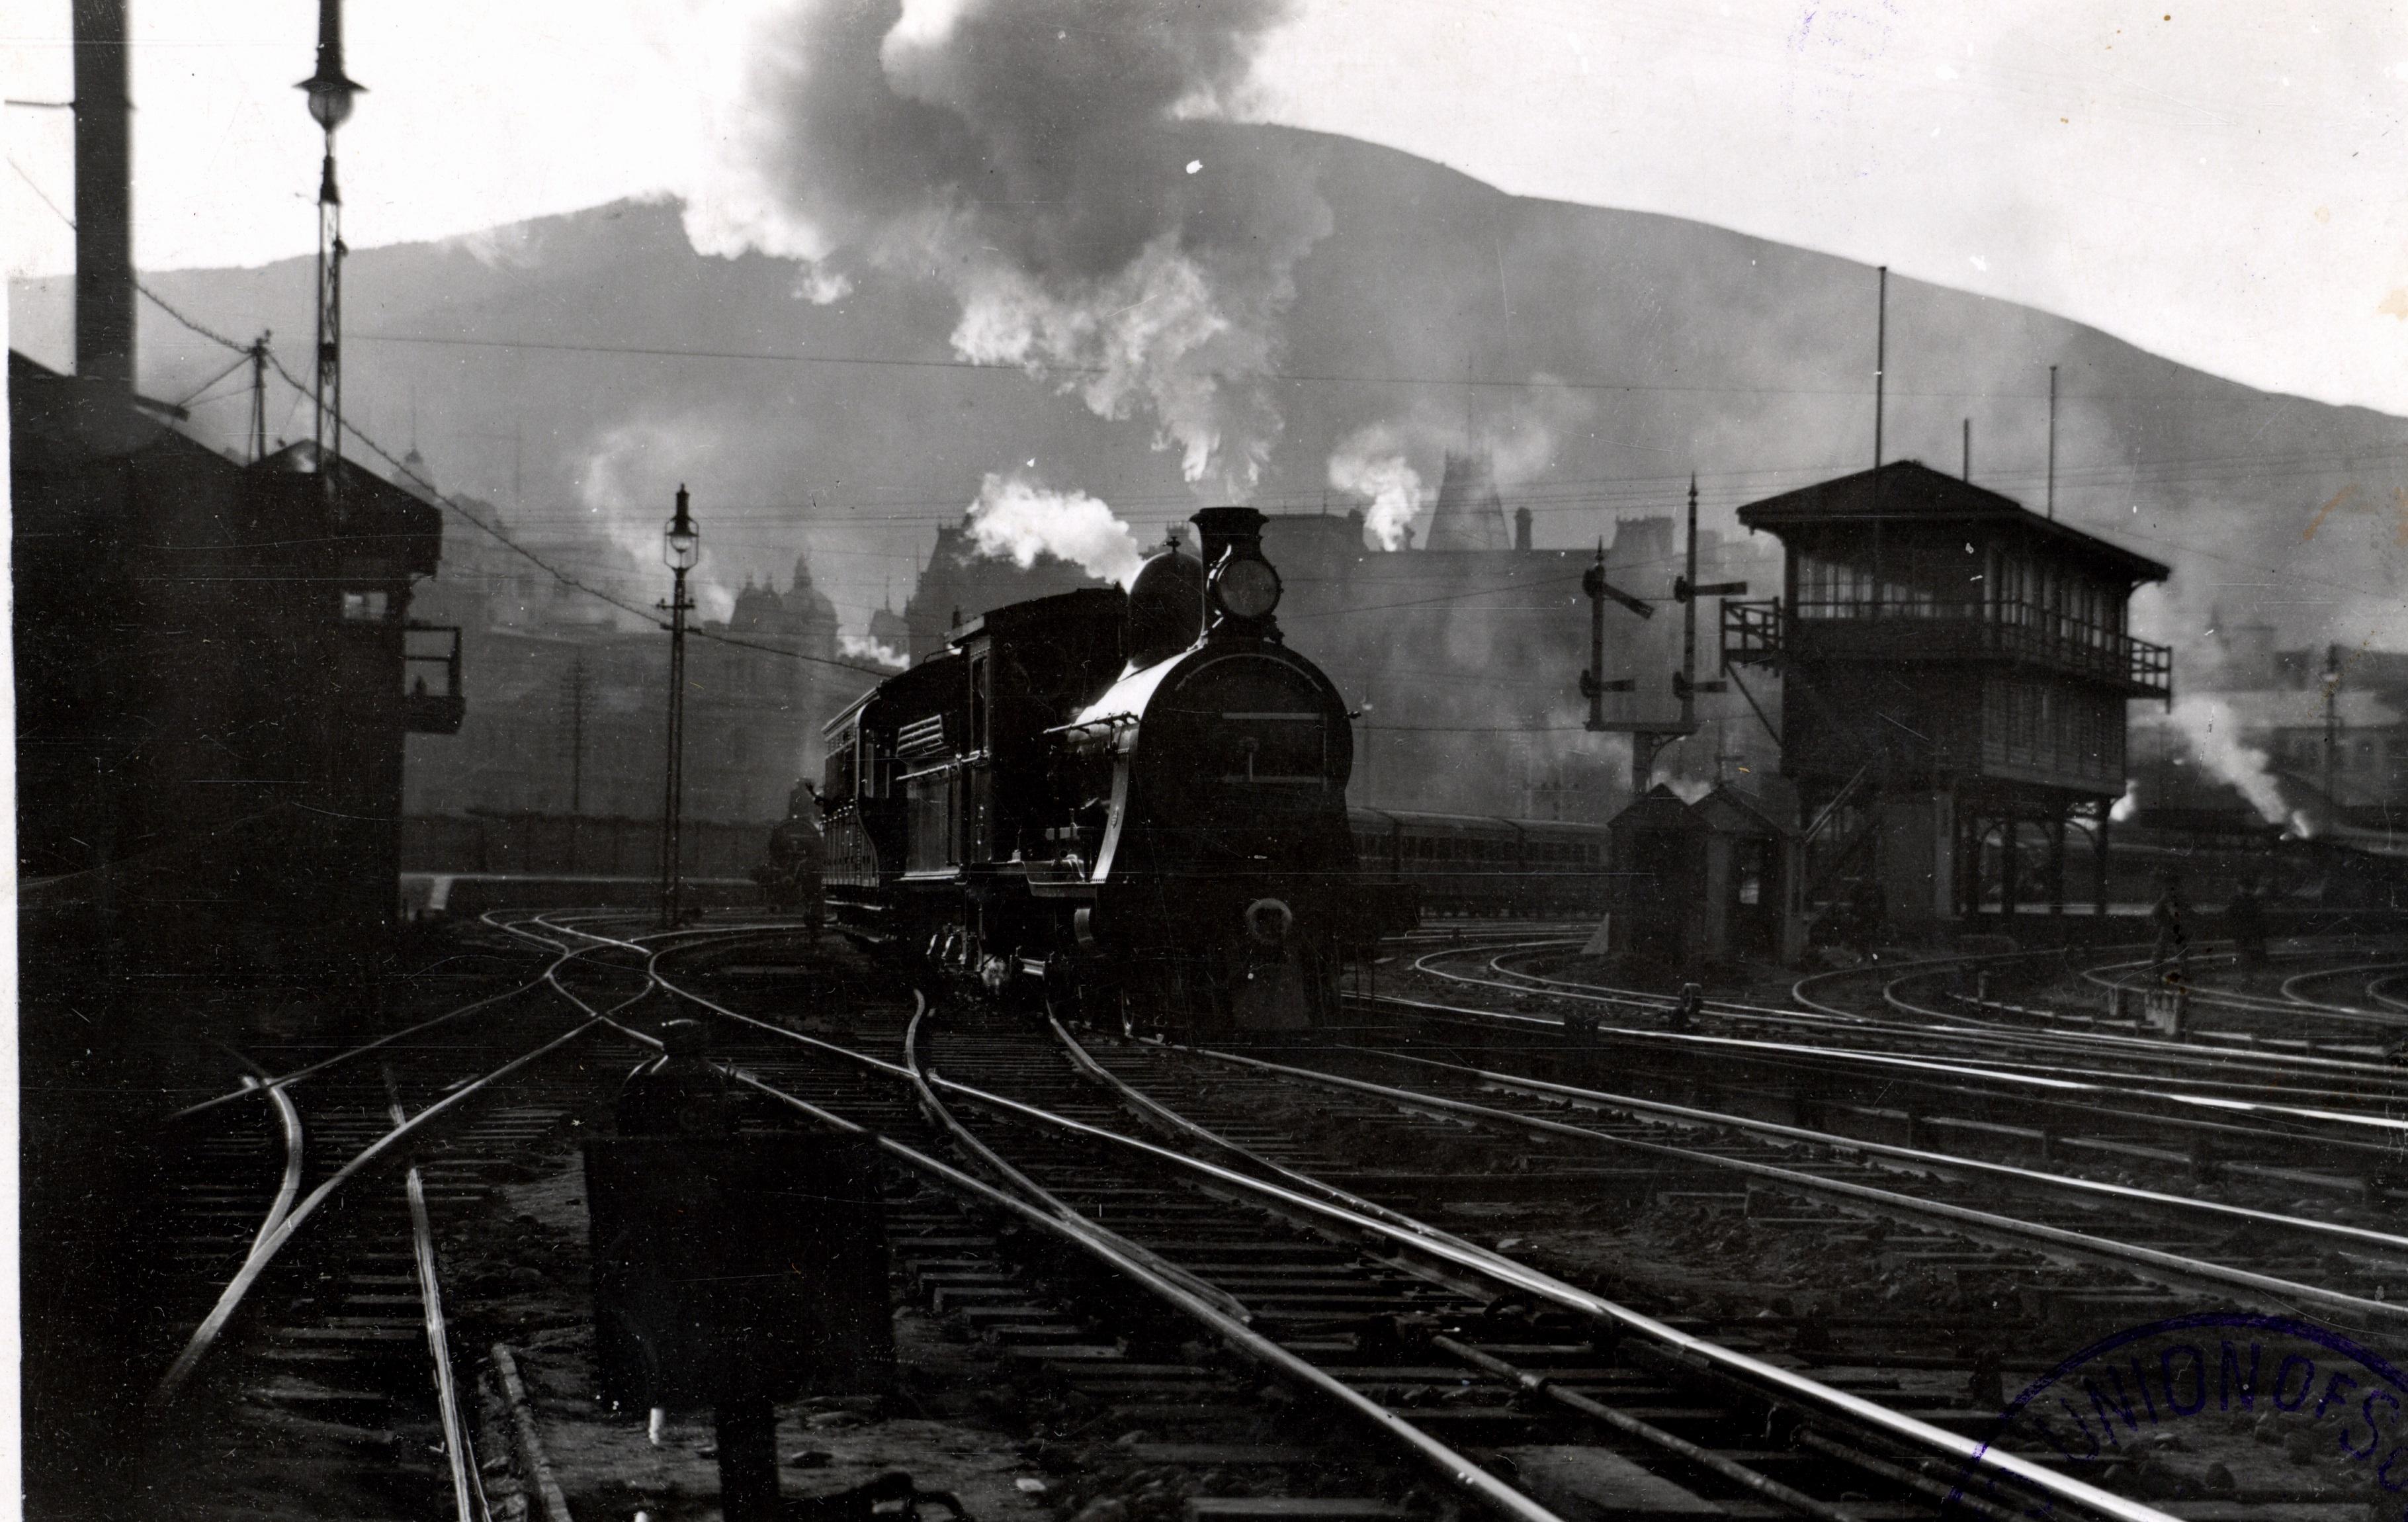 Cape Town railway historic